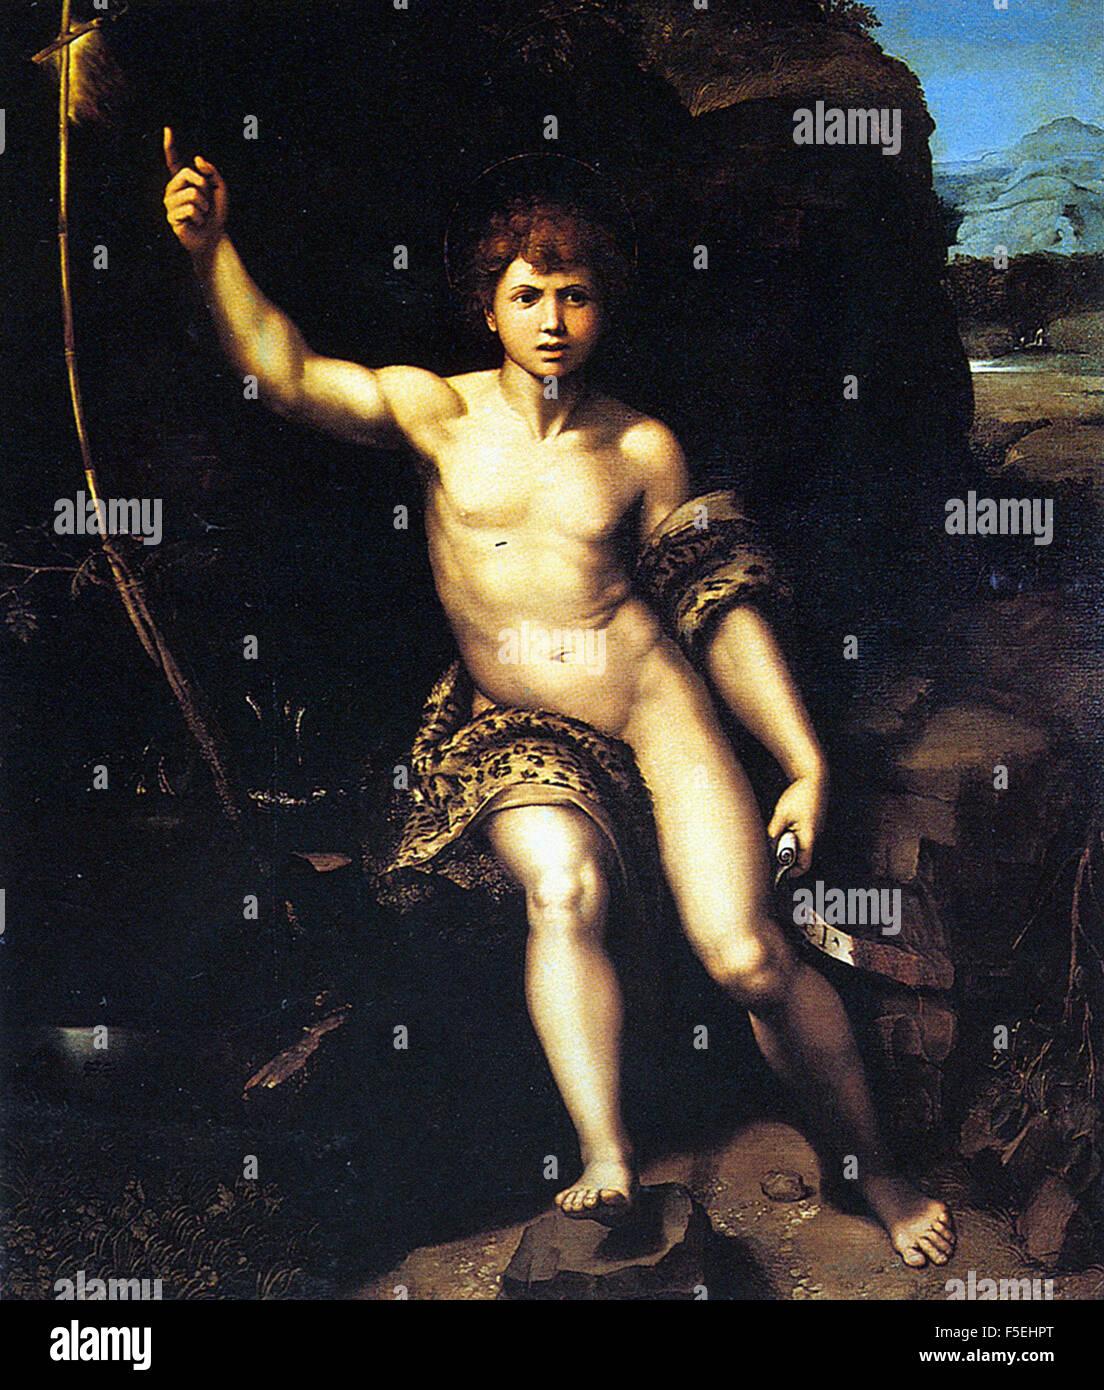 Raffaello Sanzio - Raffaello - Saint John the Baptist in the Desert 1140 Stock Photo